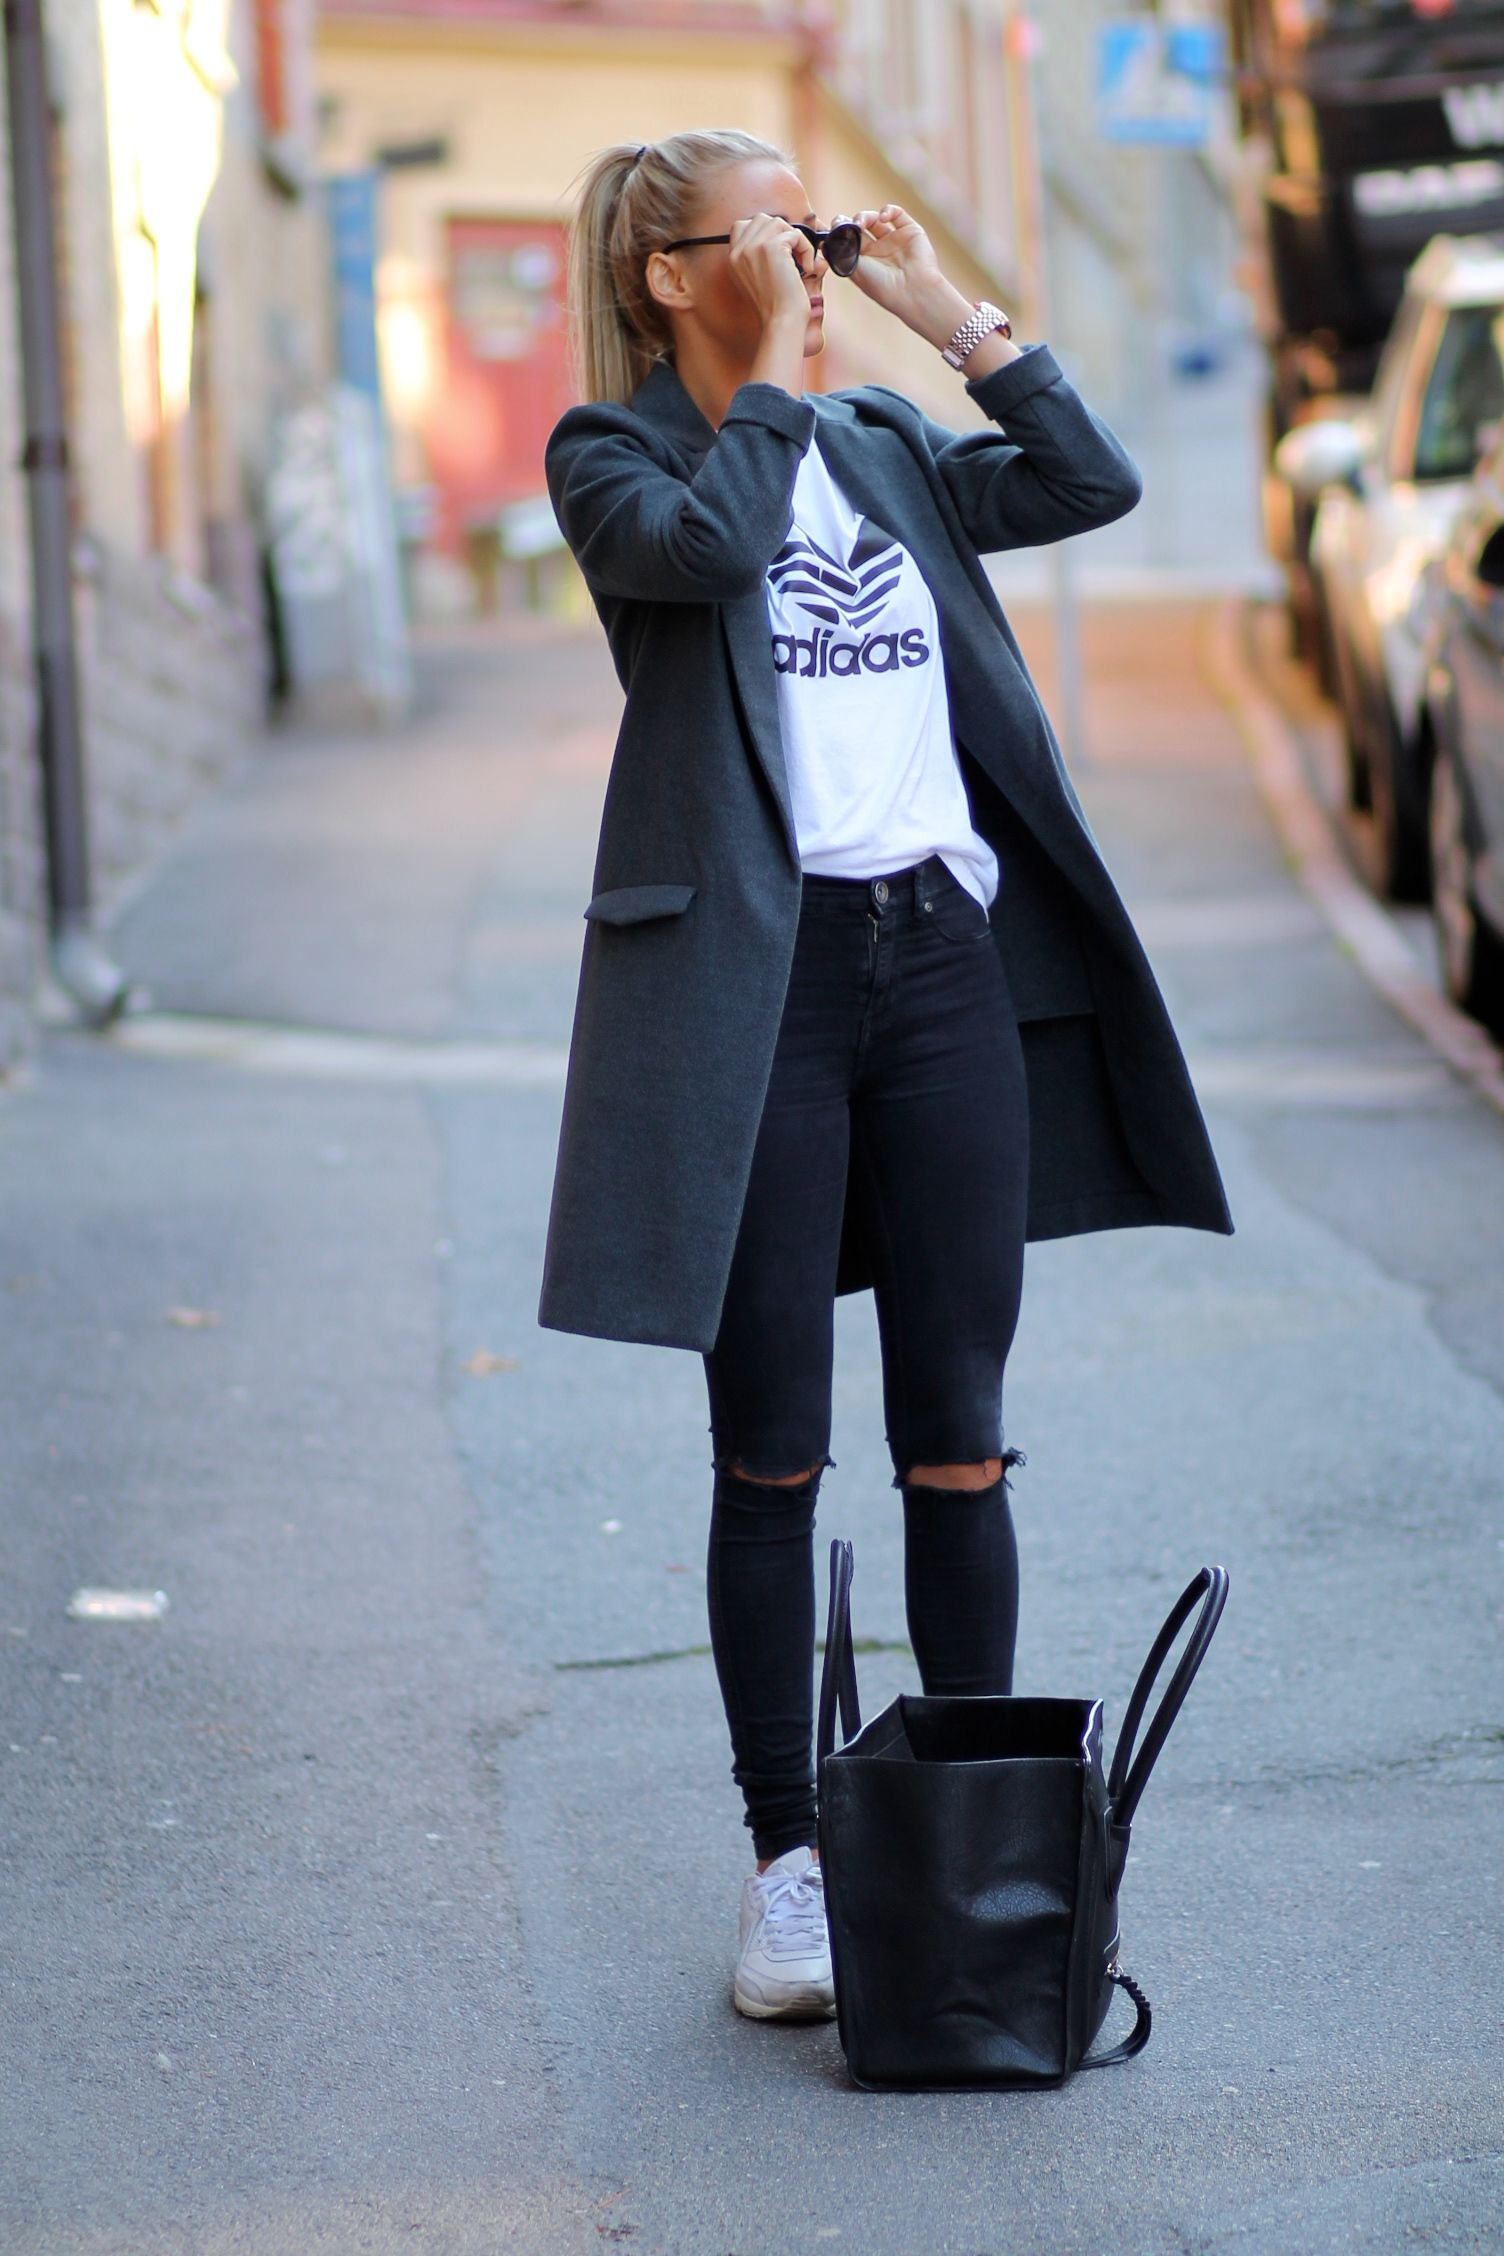 Adidas Tee l Ripped Black Denim l Dark Grey Overcoat l White Shoes l Fall  Fashion l Winter Fashion. Manteaux, Robe Boule, Mode Élégante, Mode Femme  ... d28826749be